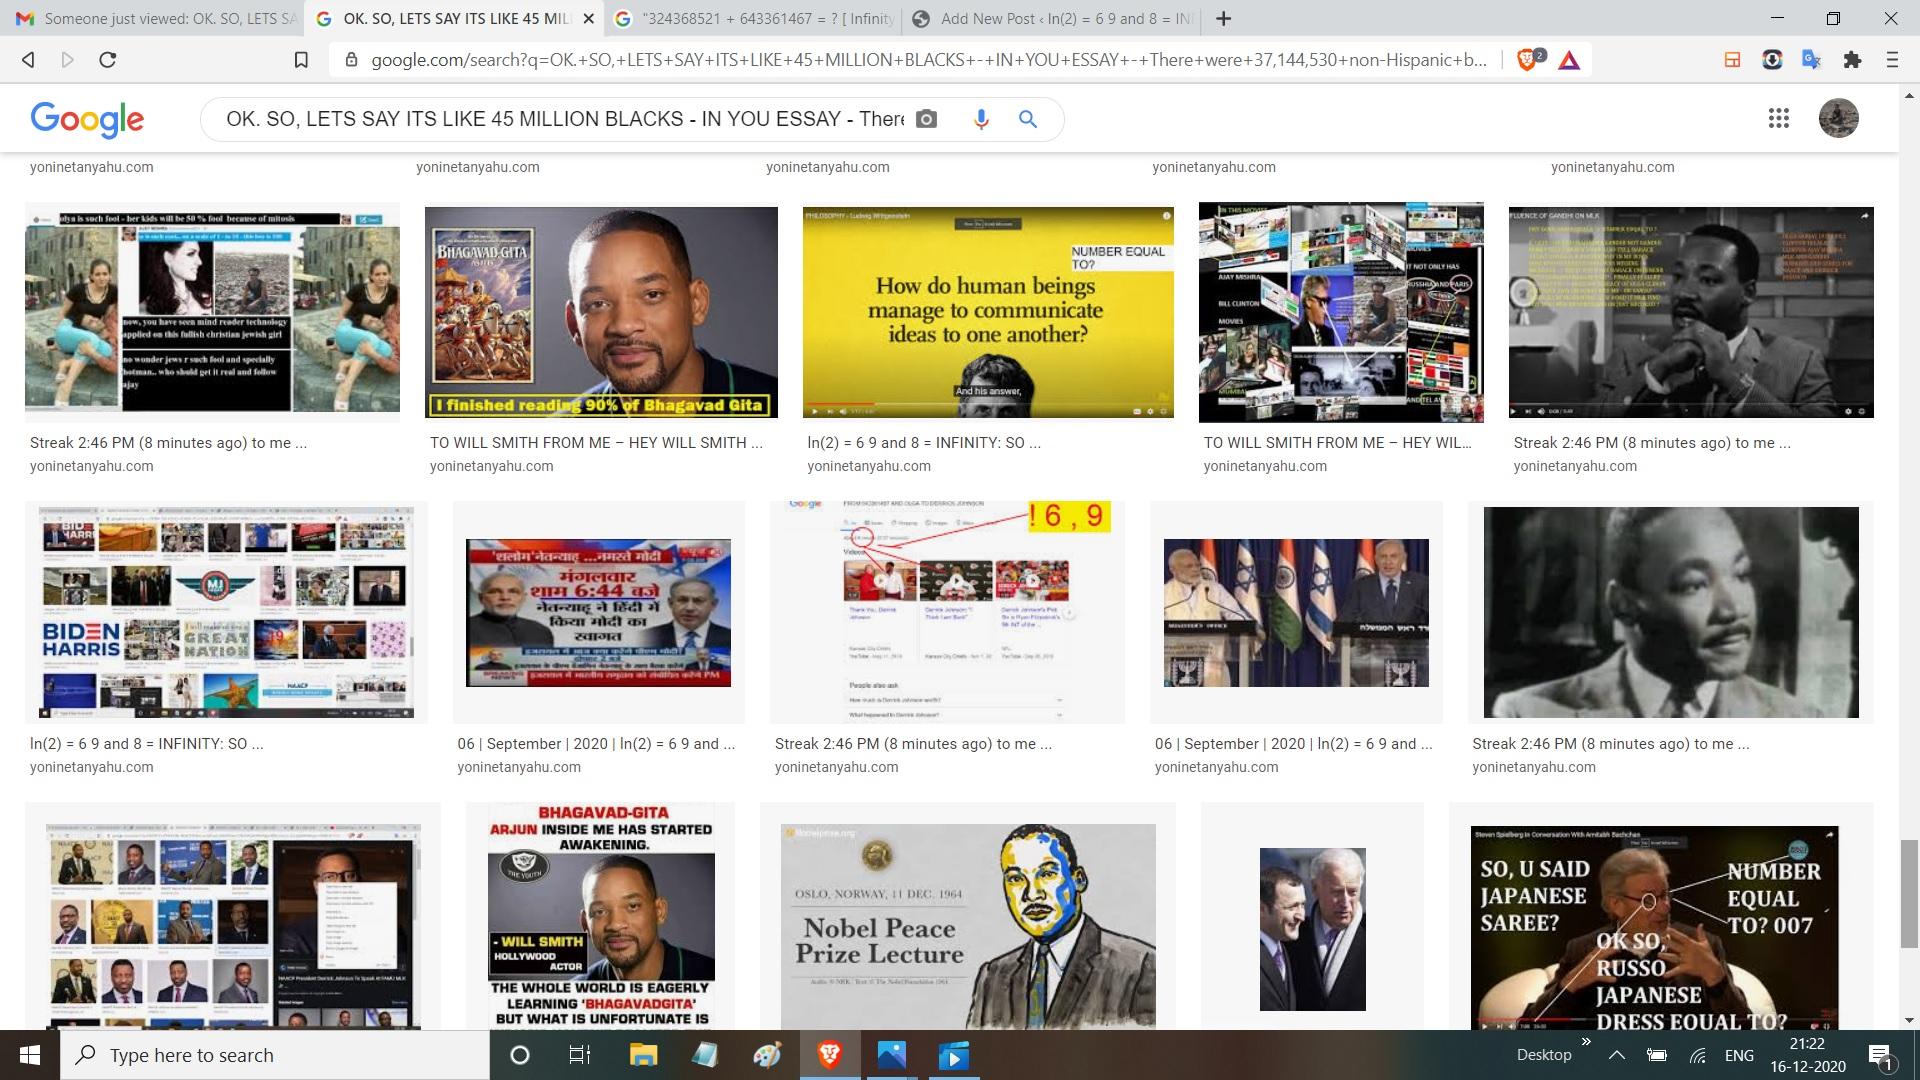 69 BLACKS AND KAMALA HARRIS 10 BILLIONPLAN ITS SAYS 69